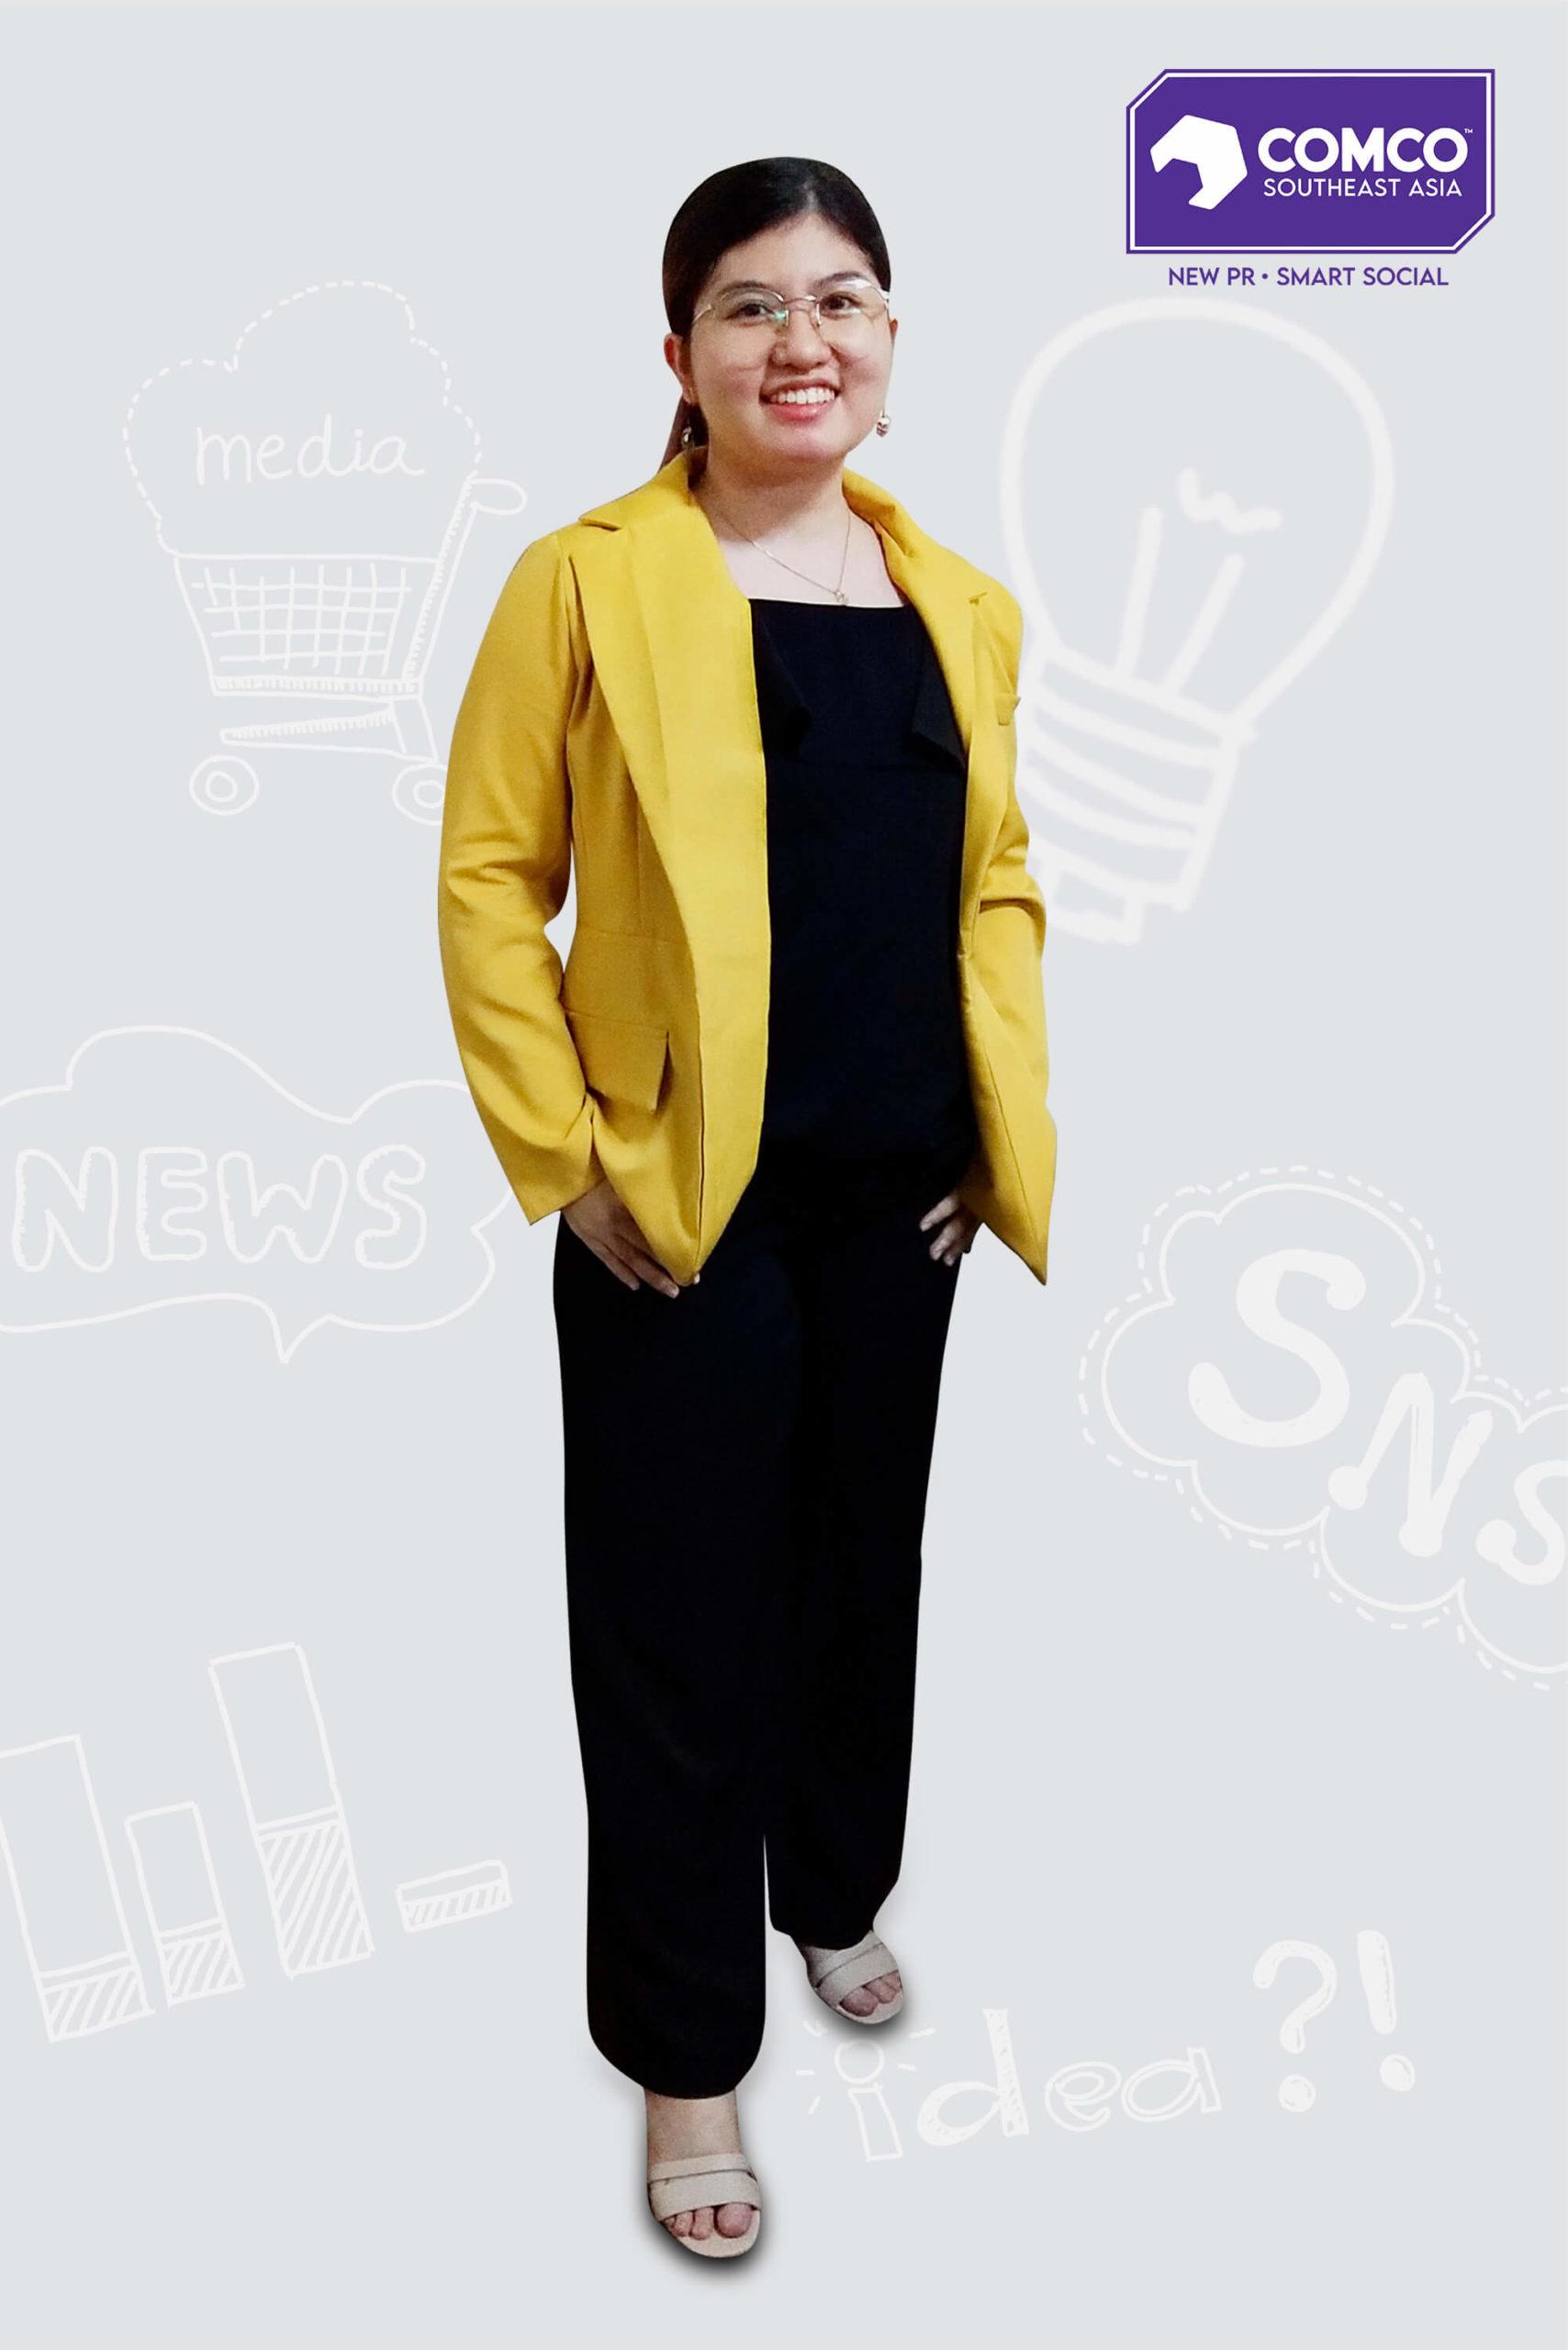 Patricia Louise Yap